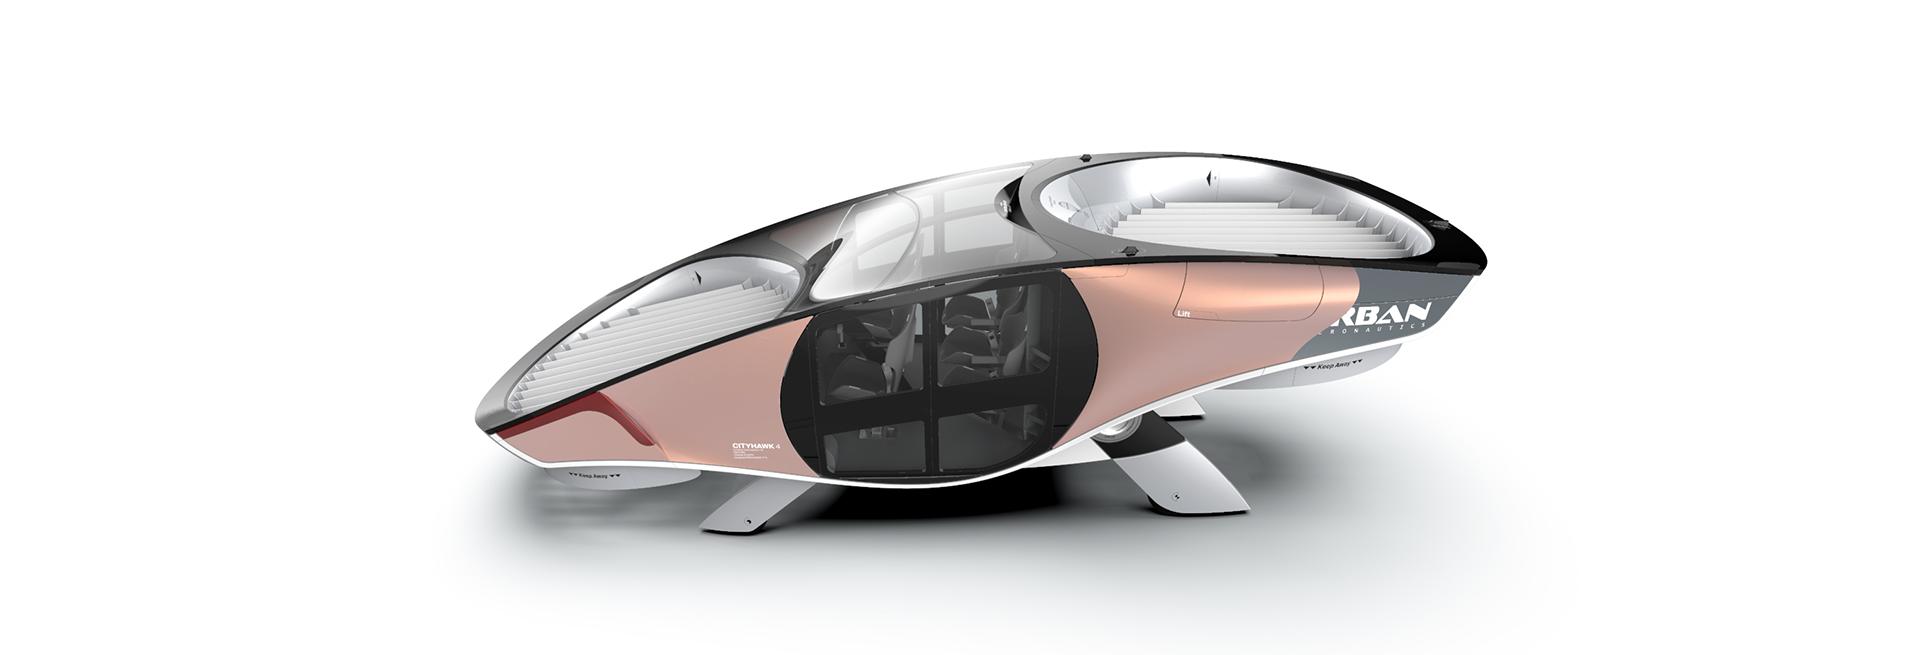 protótipo do CityHawk, eVTOL da Urban Aeronautics.